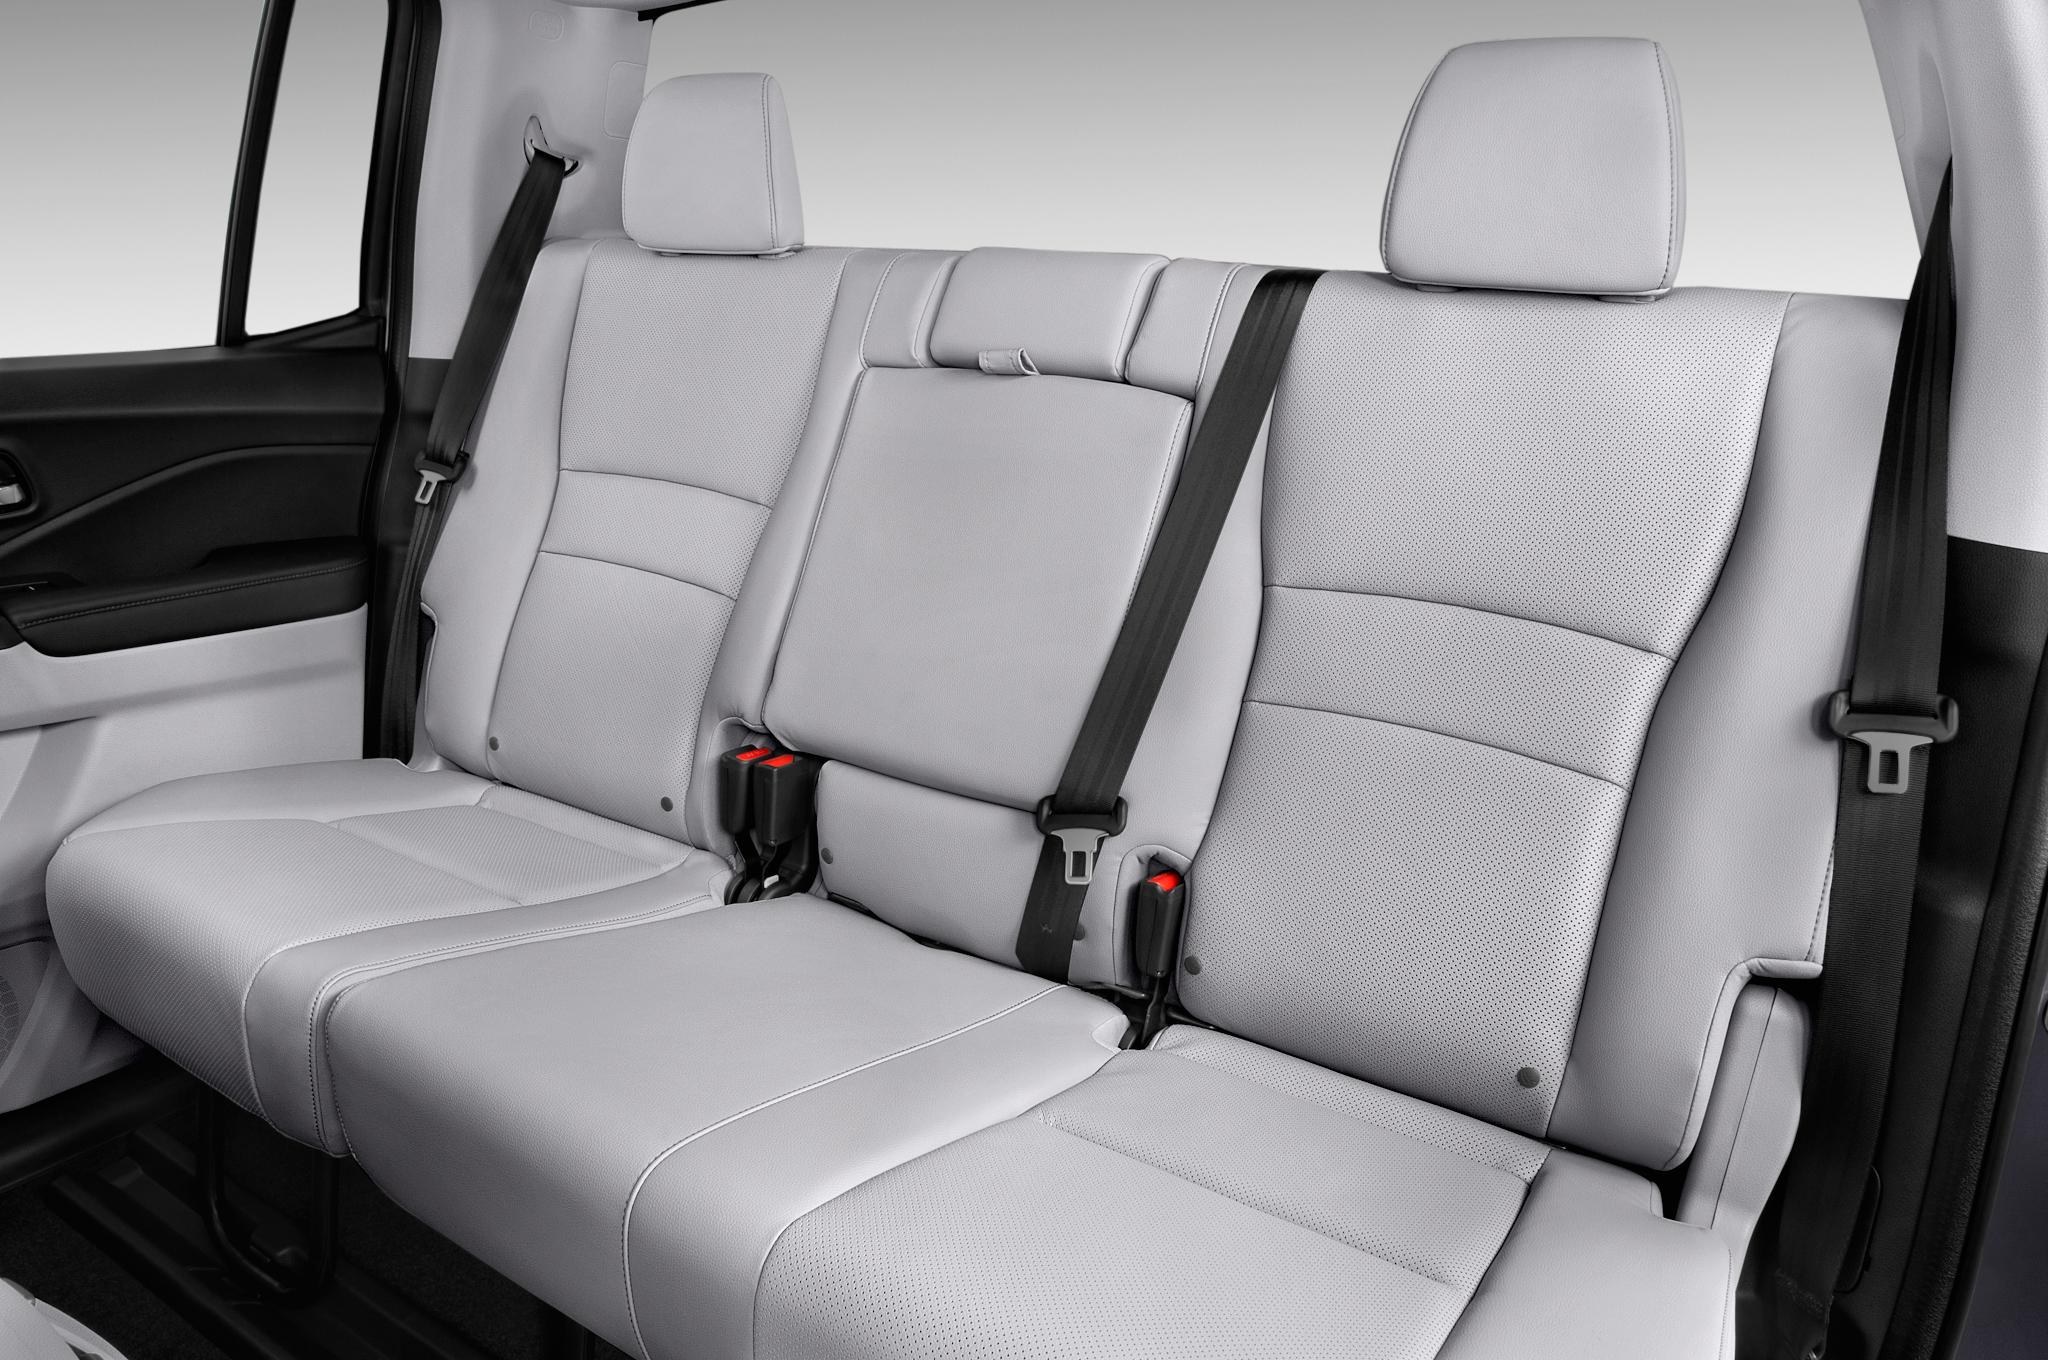 Rt 22 Honda >> 2017 Honda Ridgeline Shows Off Its Truck Bed Toughness ...